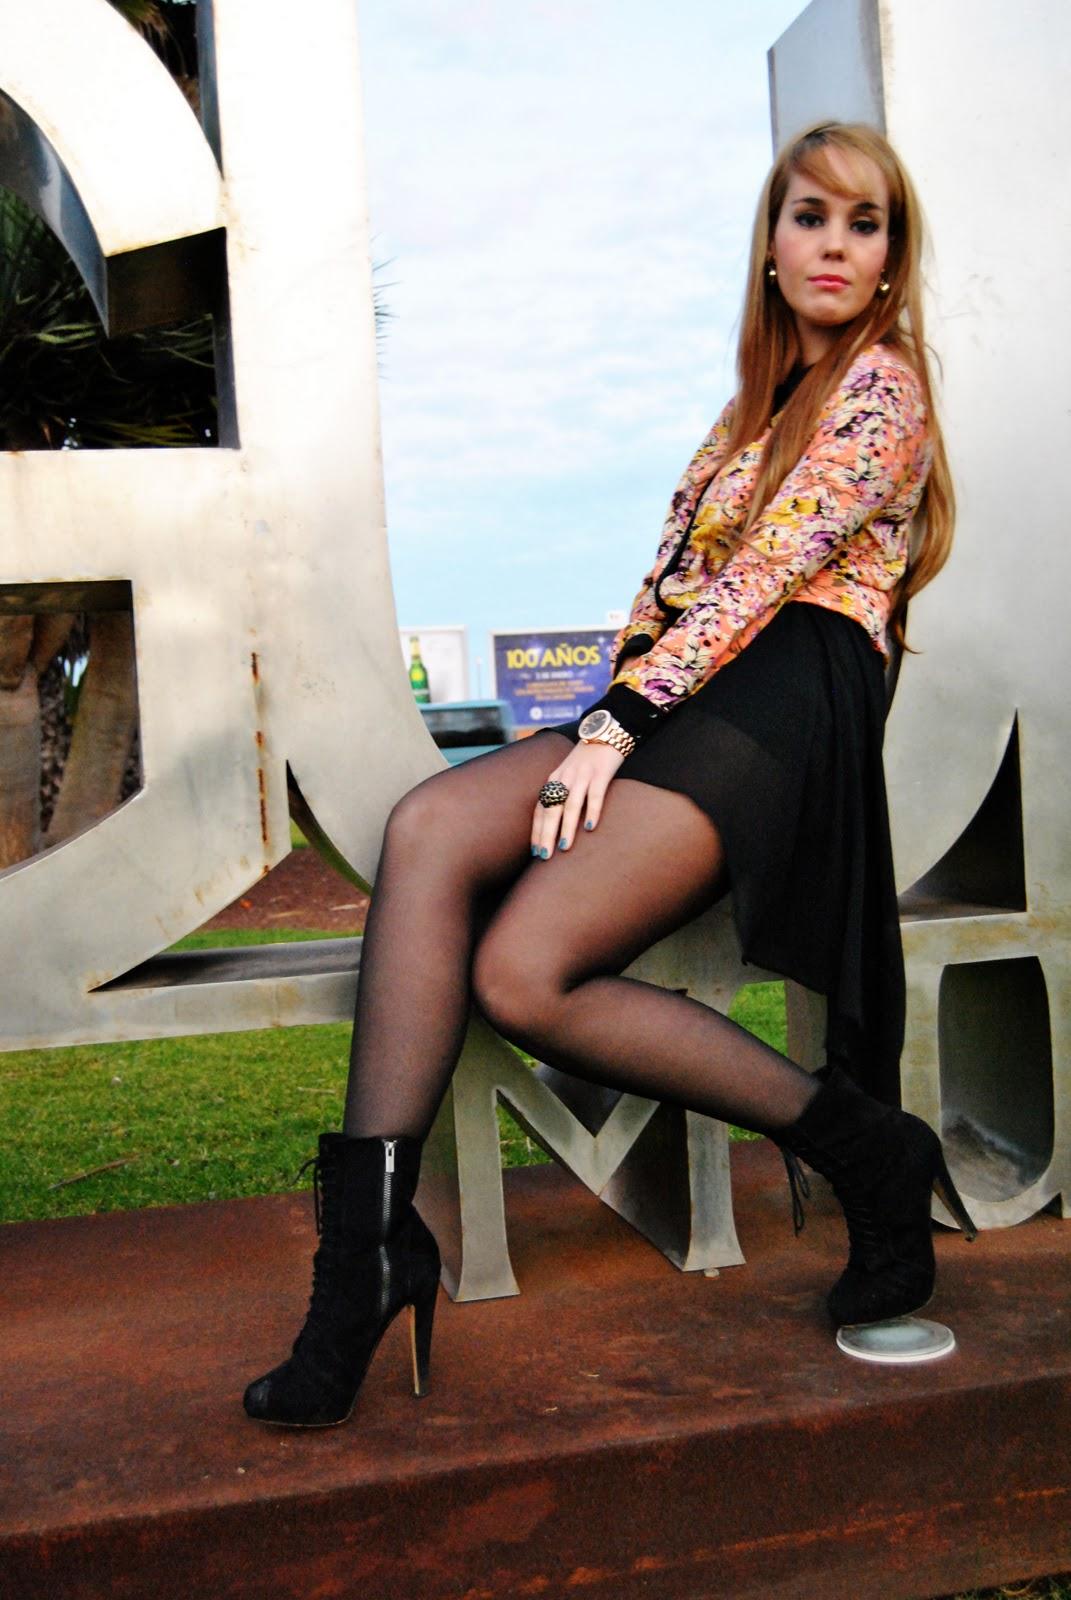 nery hdez, flowers print, asymmetric skirt